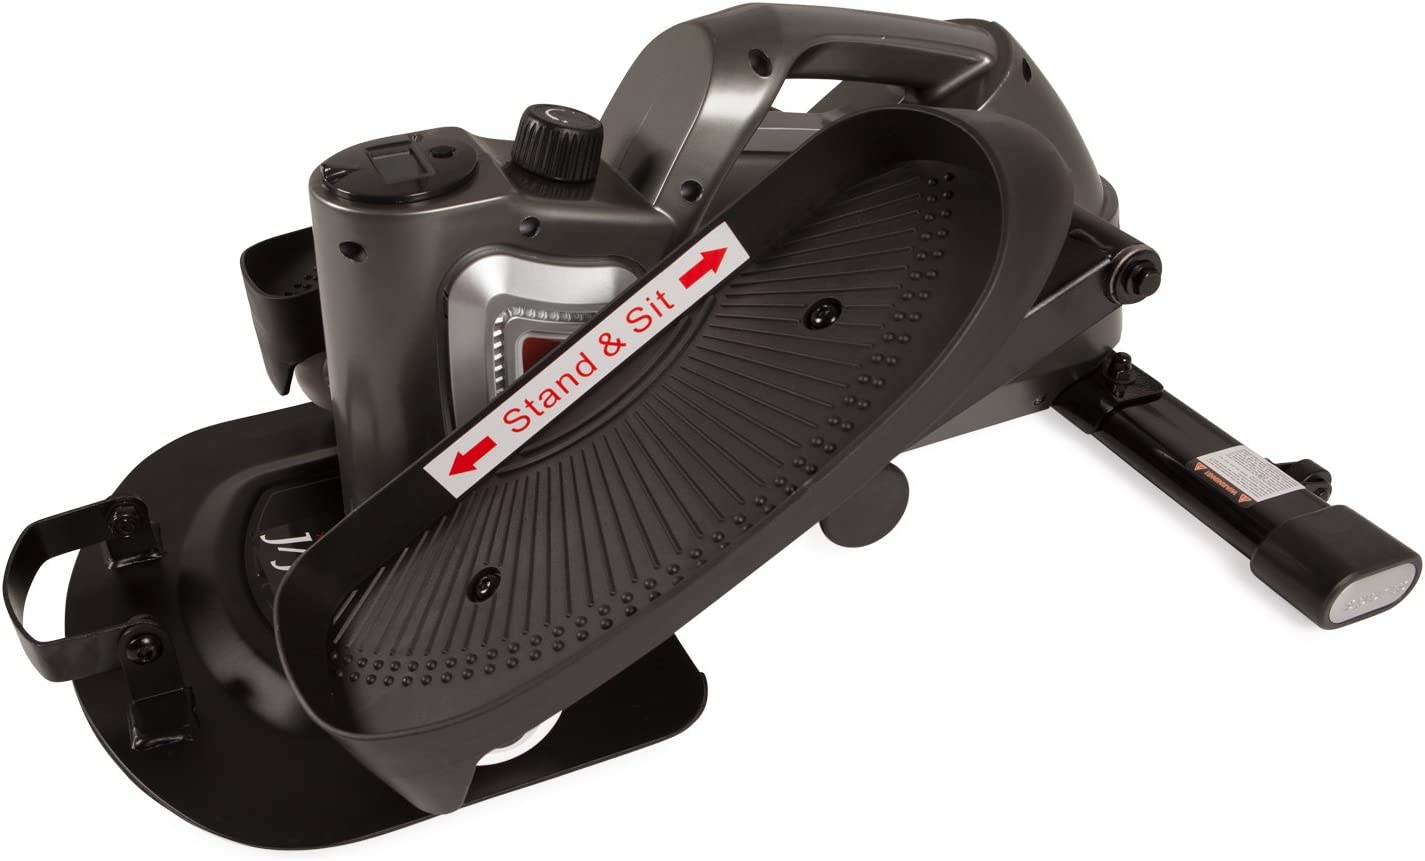 jfit Under Desk Stand Up Mini Elliptical Stepper w Adjustable Angle The Ideal Fitness Exercise Equipment for Home Ideal for Men, Women, Kids Seniors Premium Home Gym Equipment